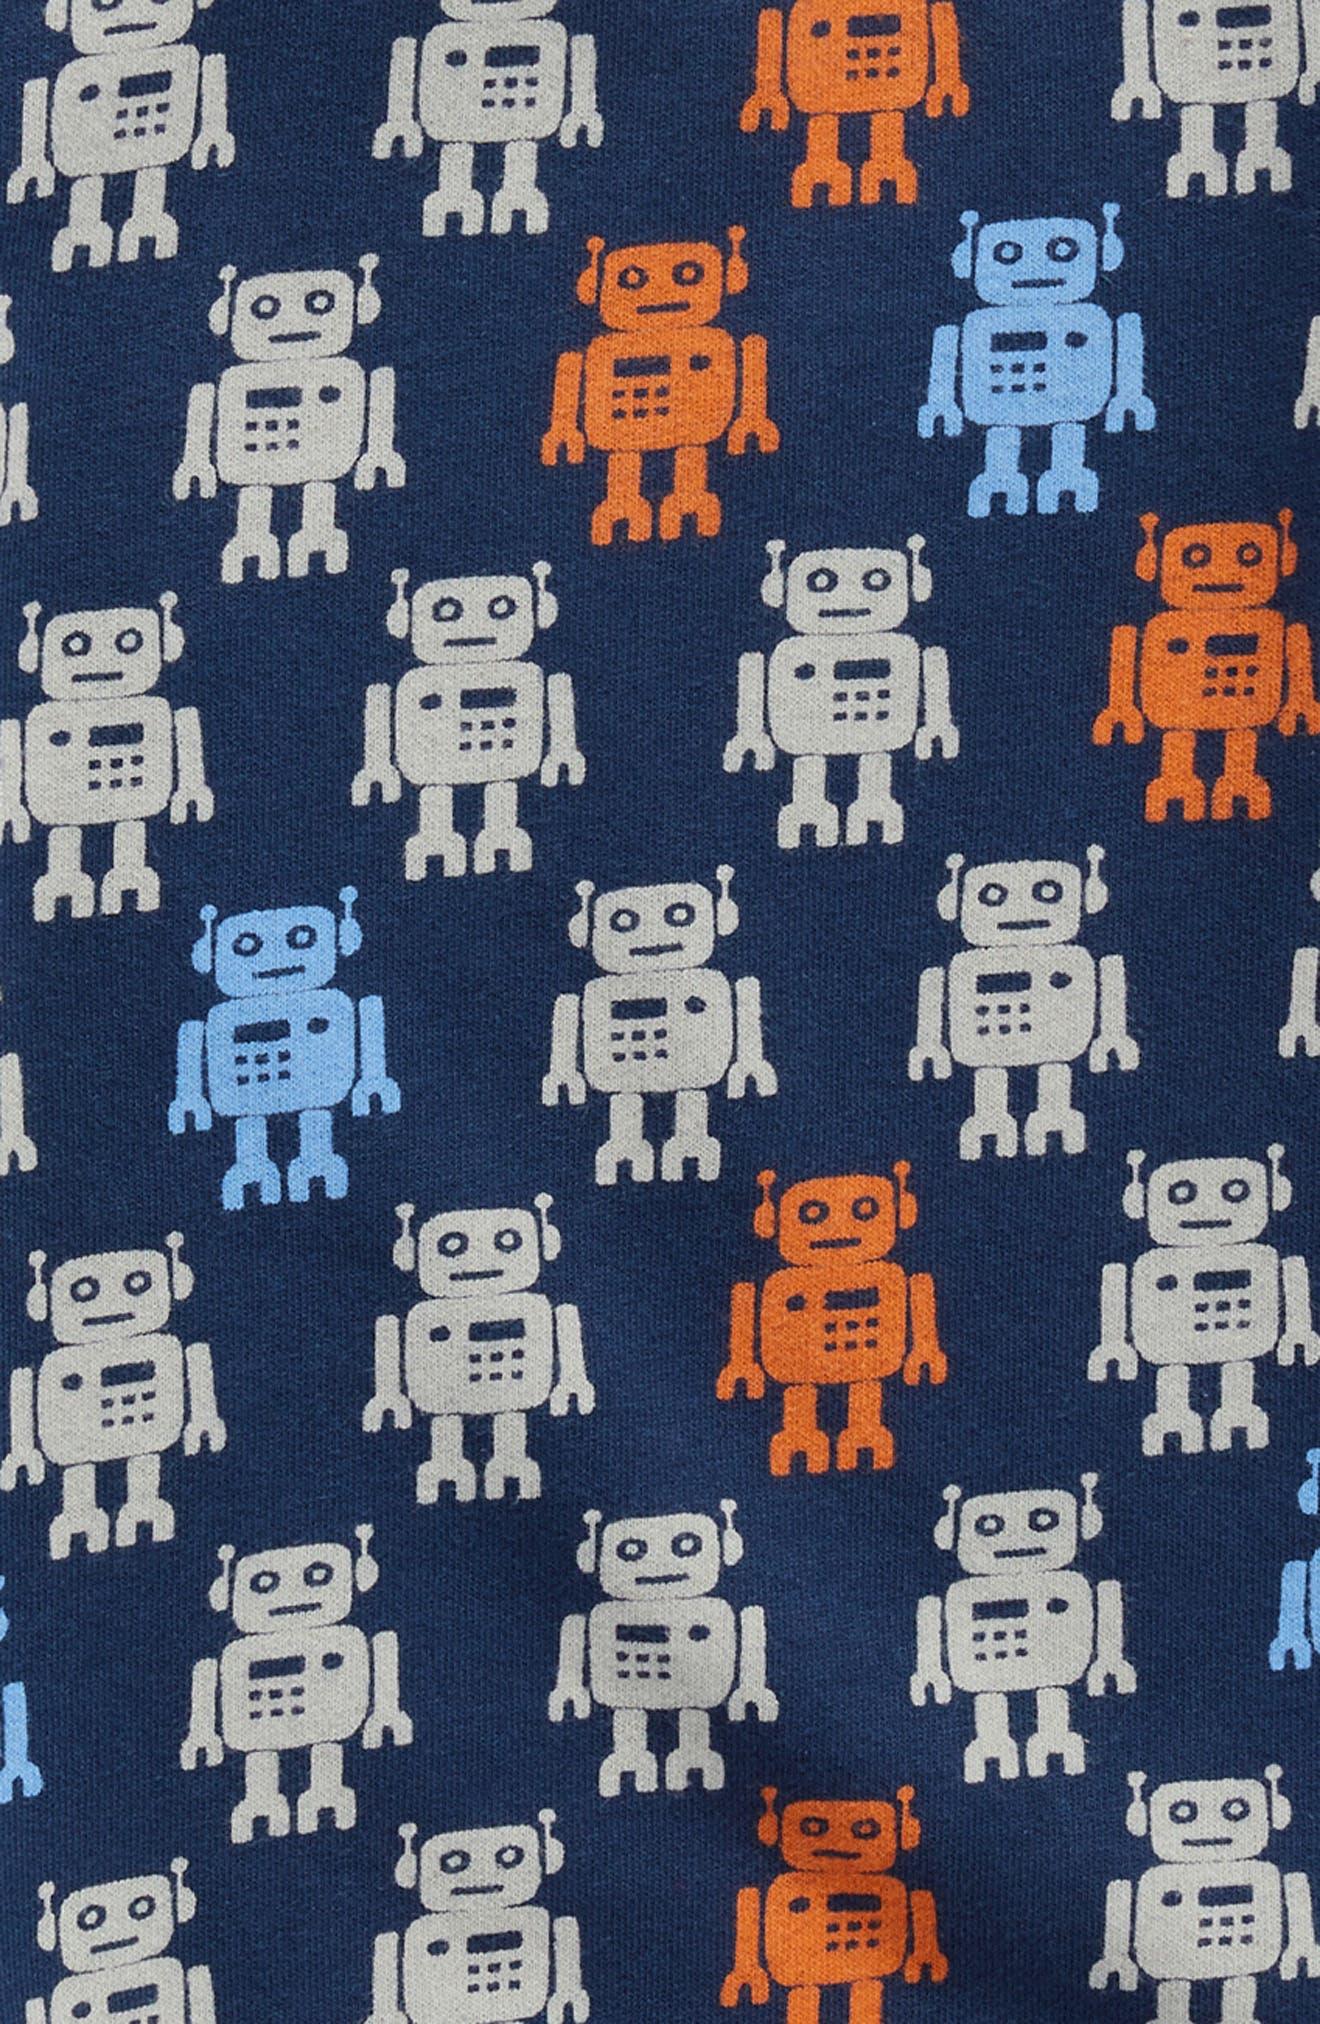 Robot Print Sweatshirt,                             Alternate thumbnail 3, color,                             Navy Dress Robot